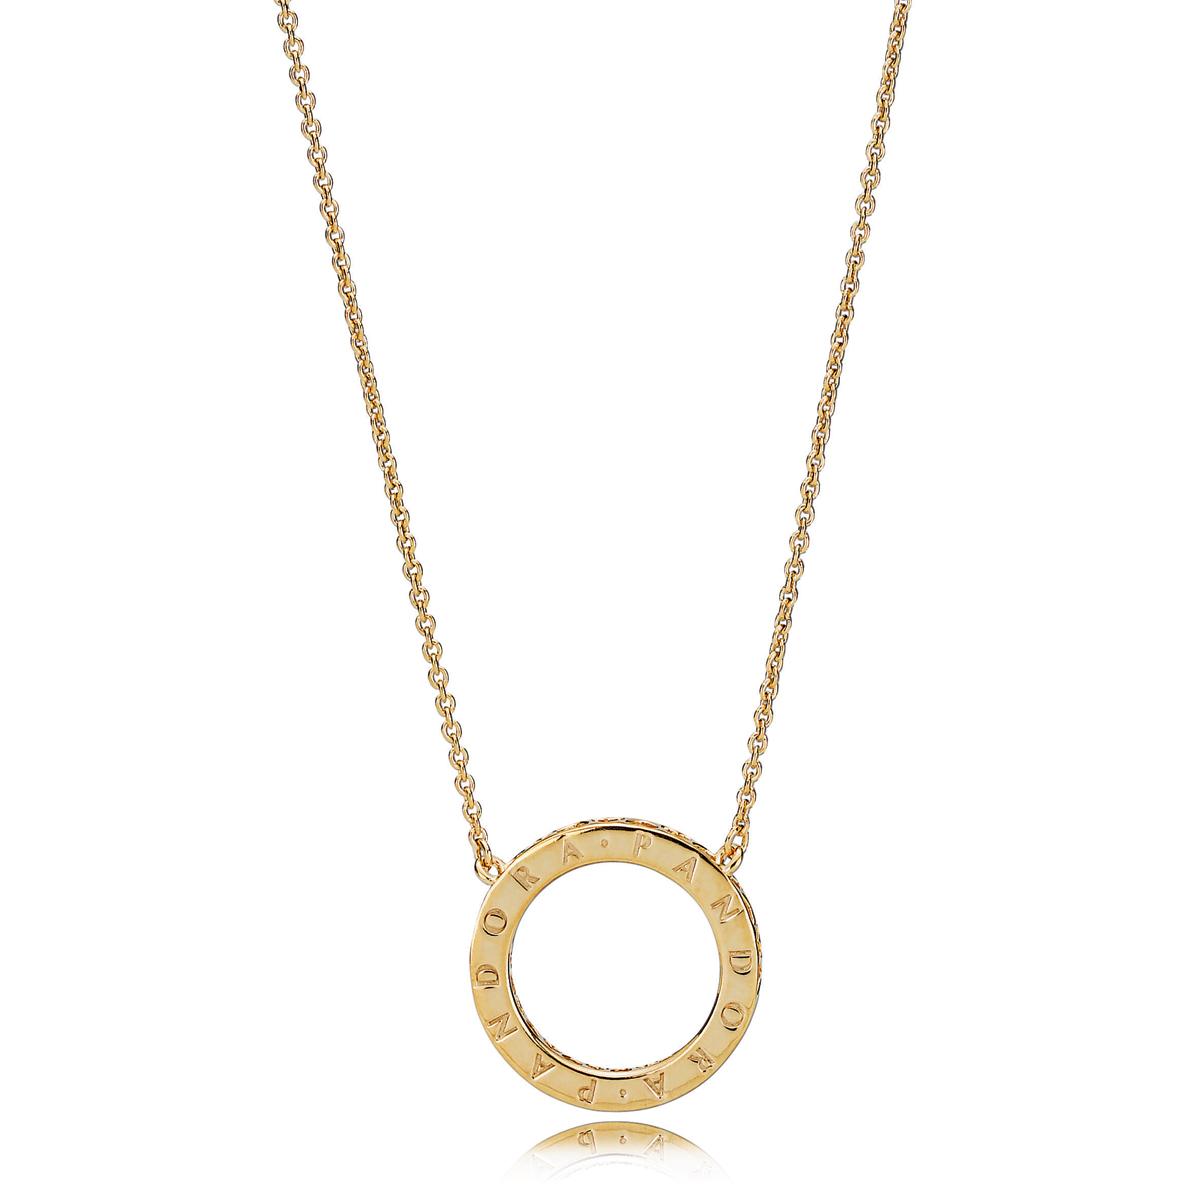 Pandora necklaces pancharmbracelets pandora shine hearts of pandora necklace mozeypictures Image collections